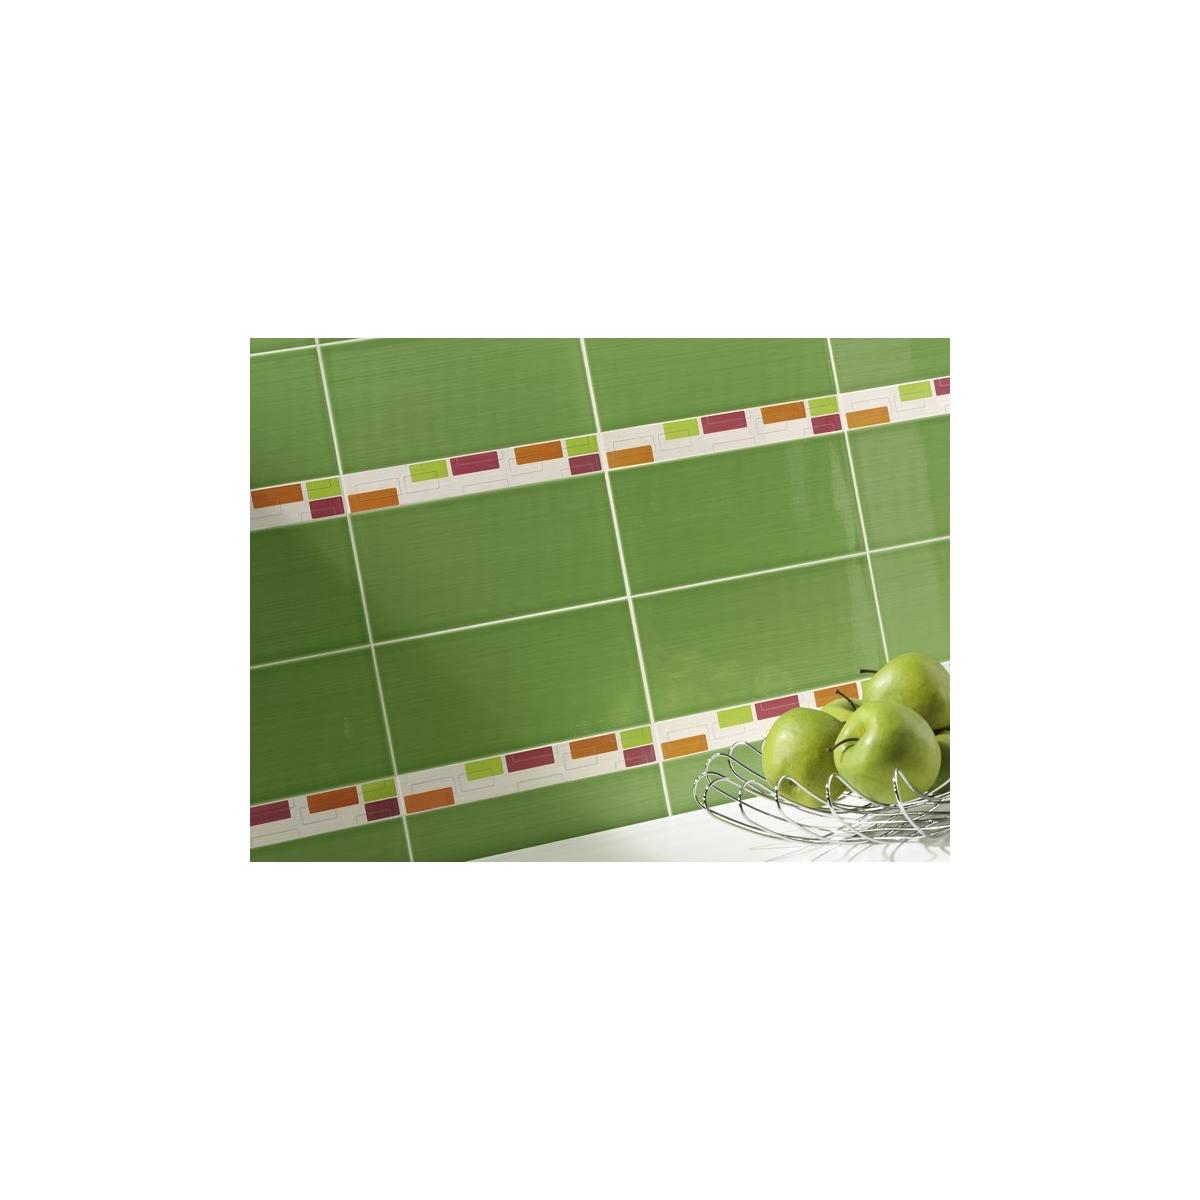 Glam Beige (Caja 1 m2) - Suelo cerámico Pasta roja Efecto Antiguo interior